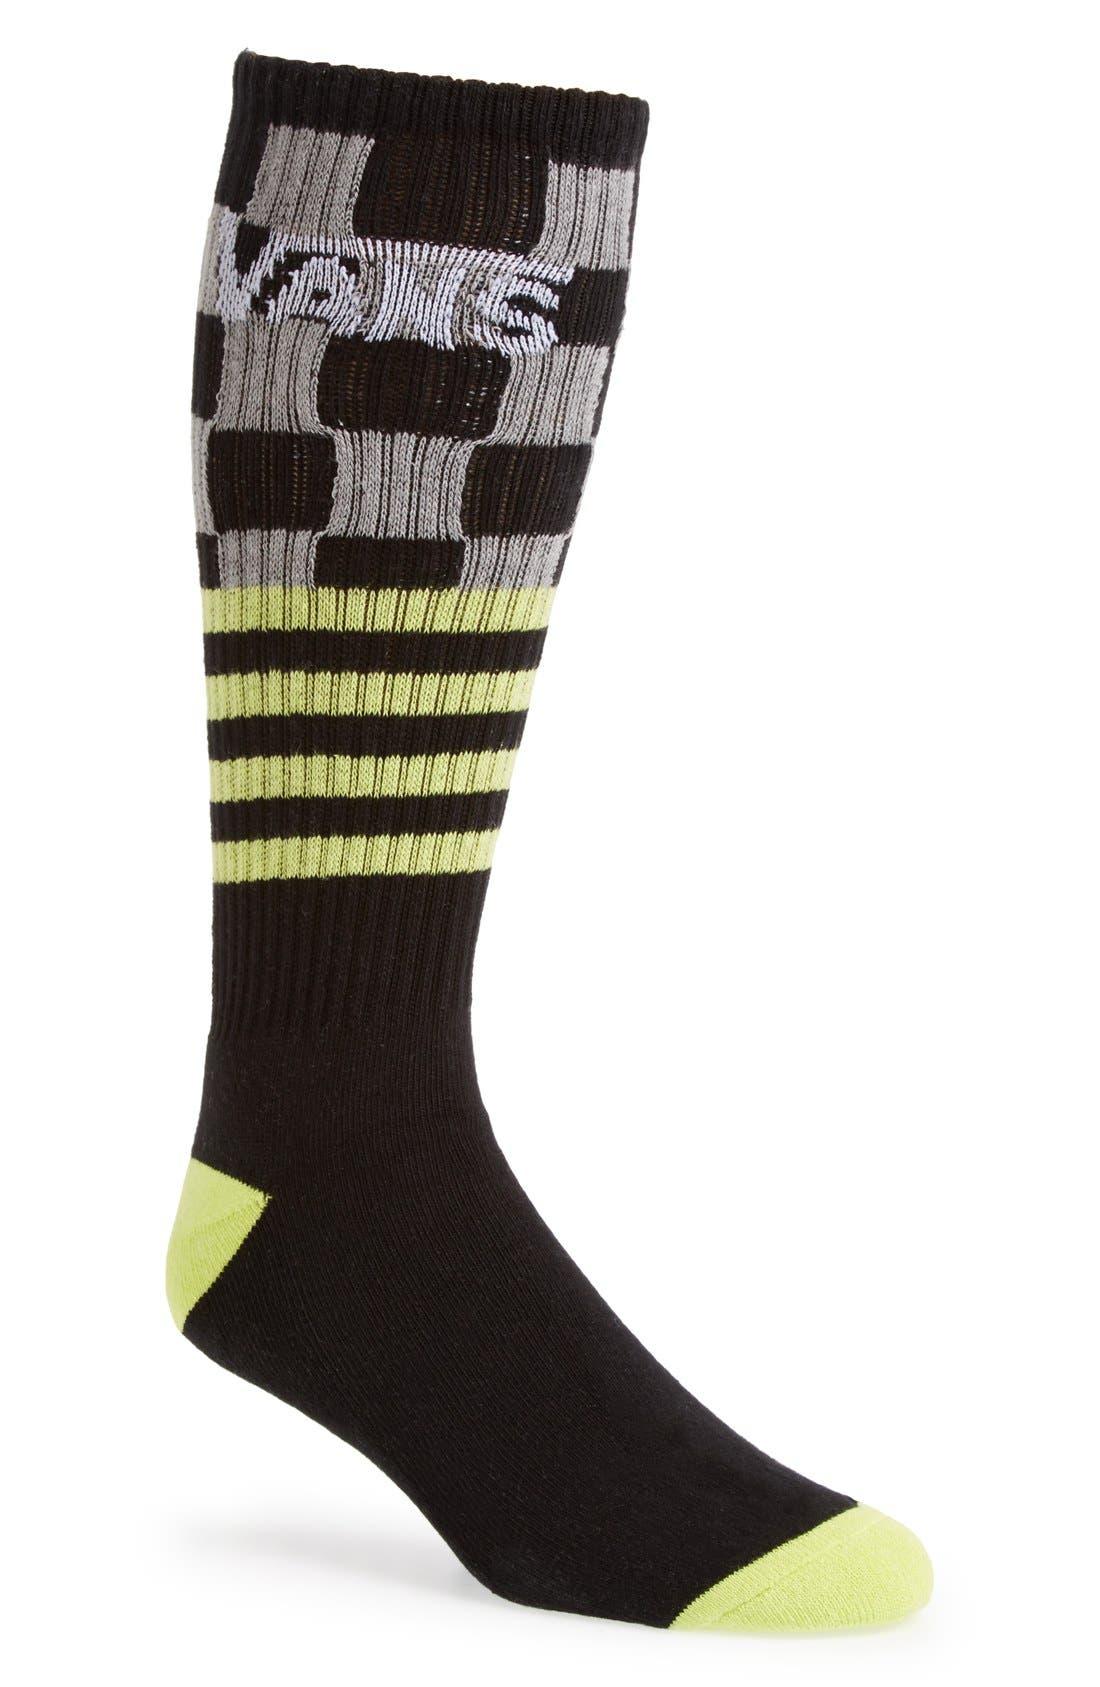 Alternate Image 1 Selected - Vans 'Check Stripe' Crew Socks